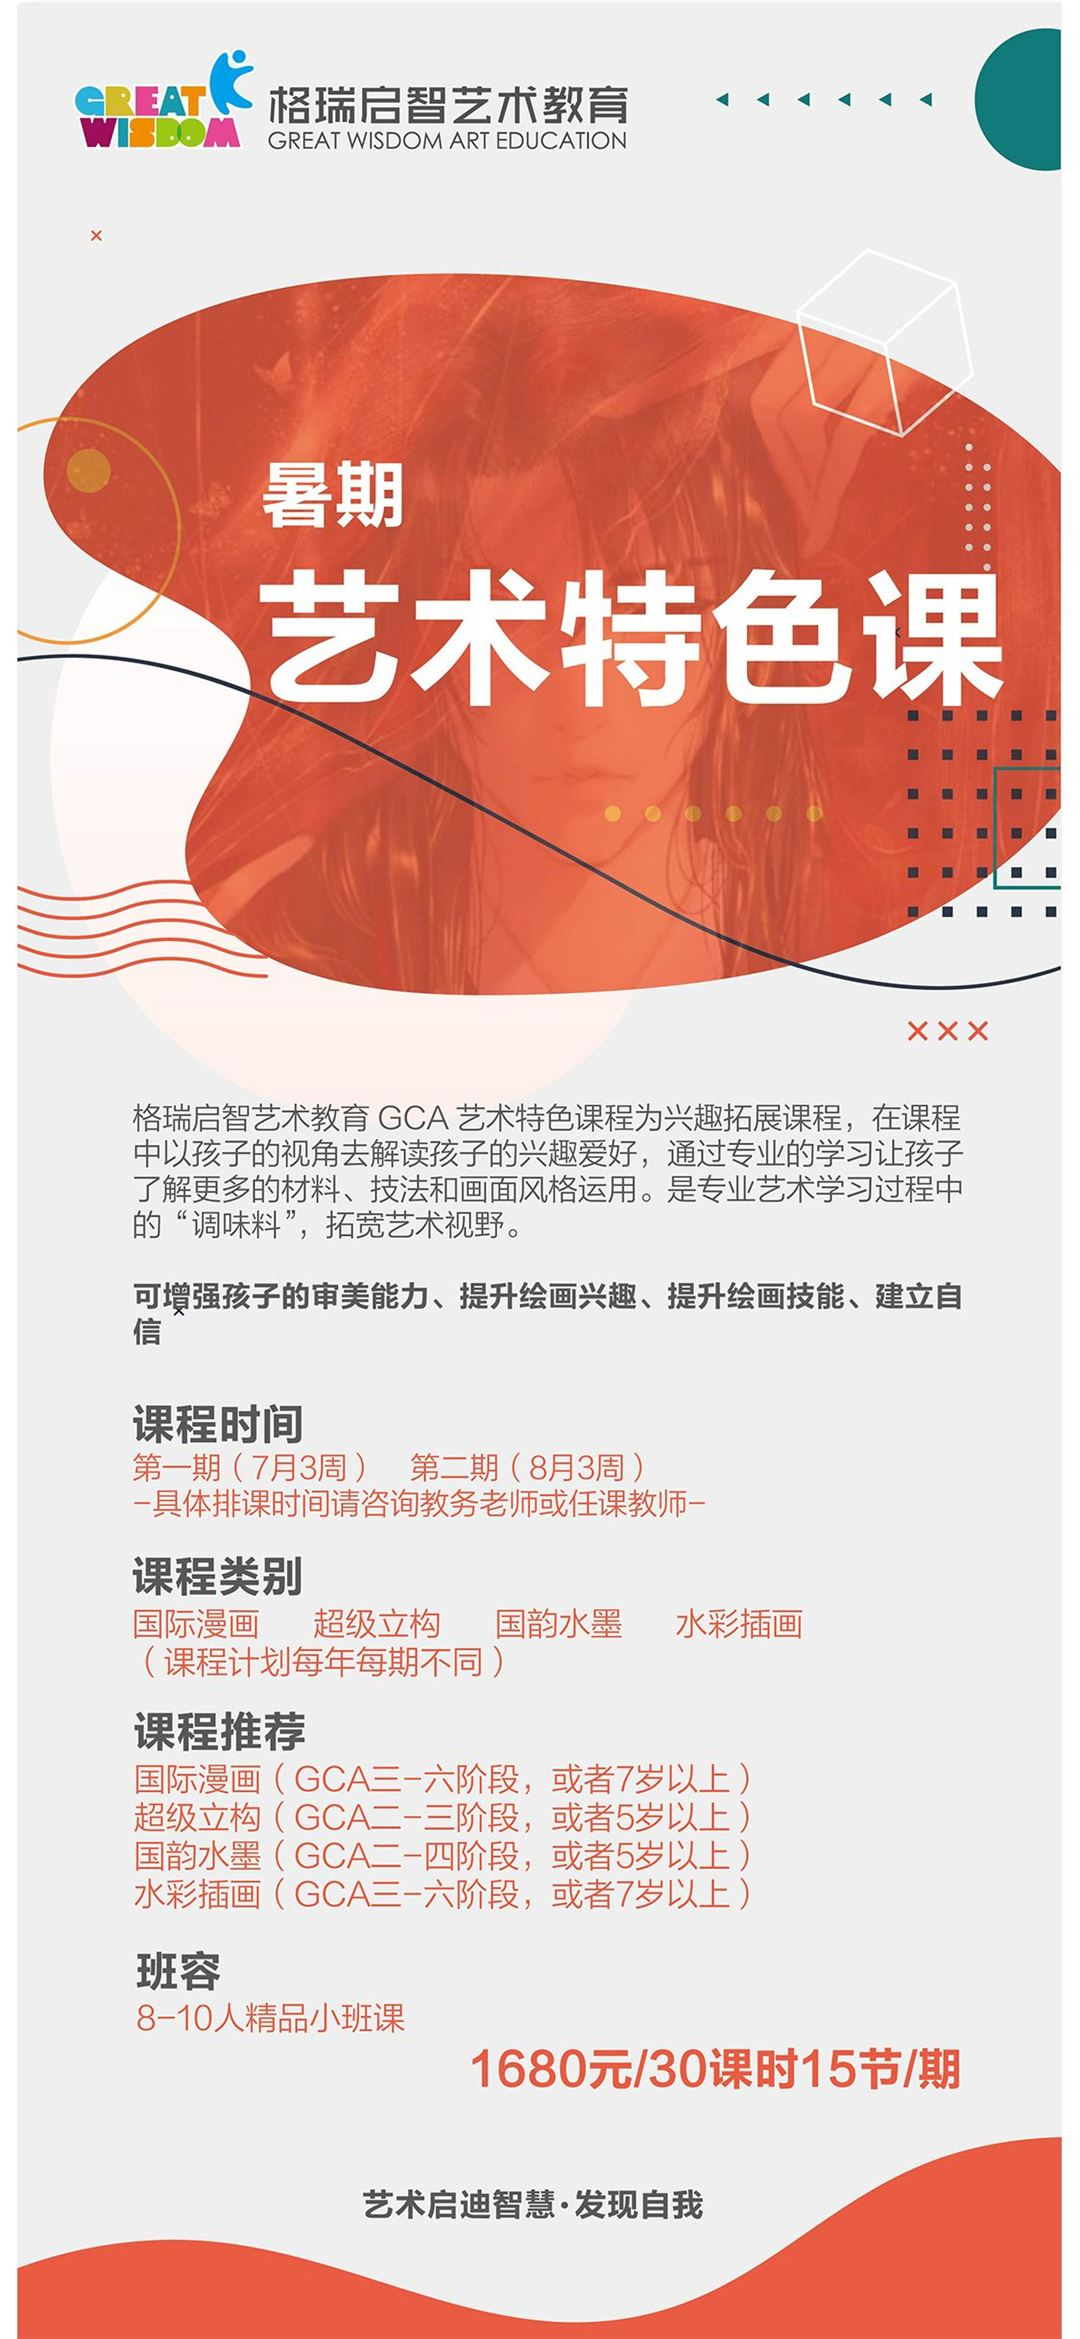 http://www.huodongxing.com/file/20210609/7564177607886/354177617399341.jpg